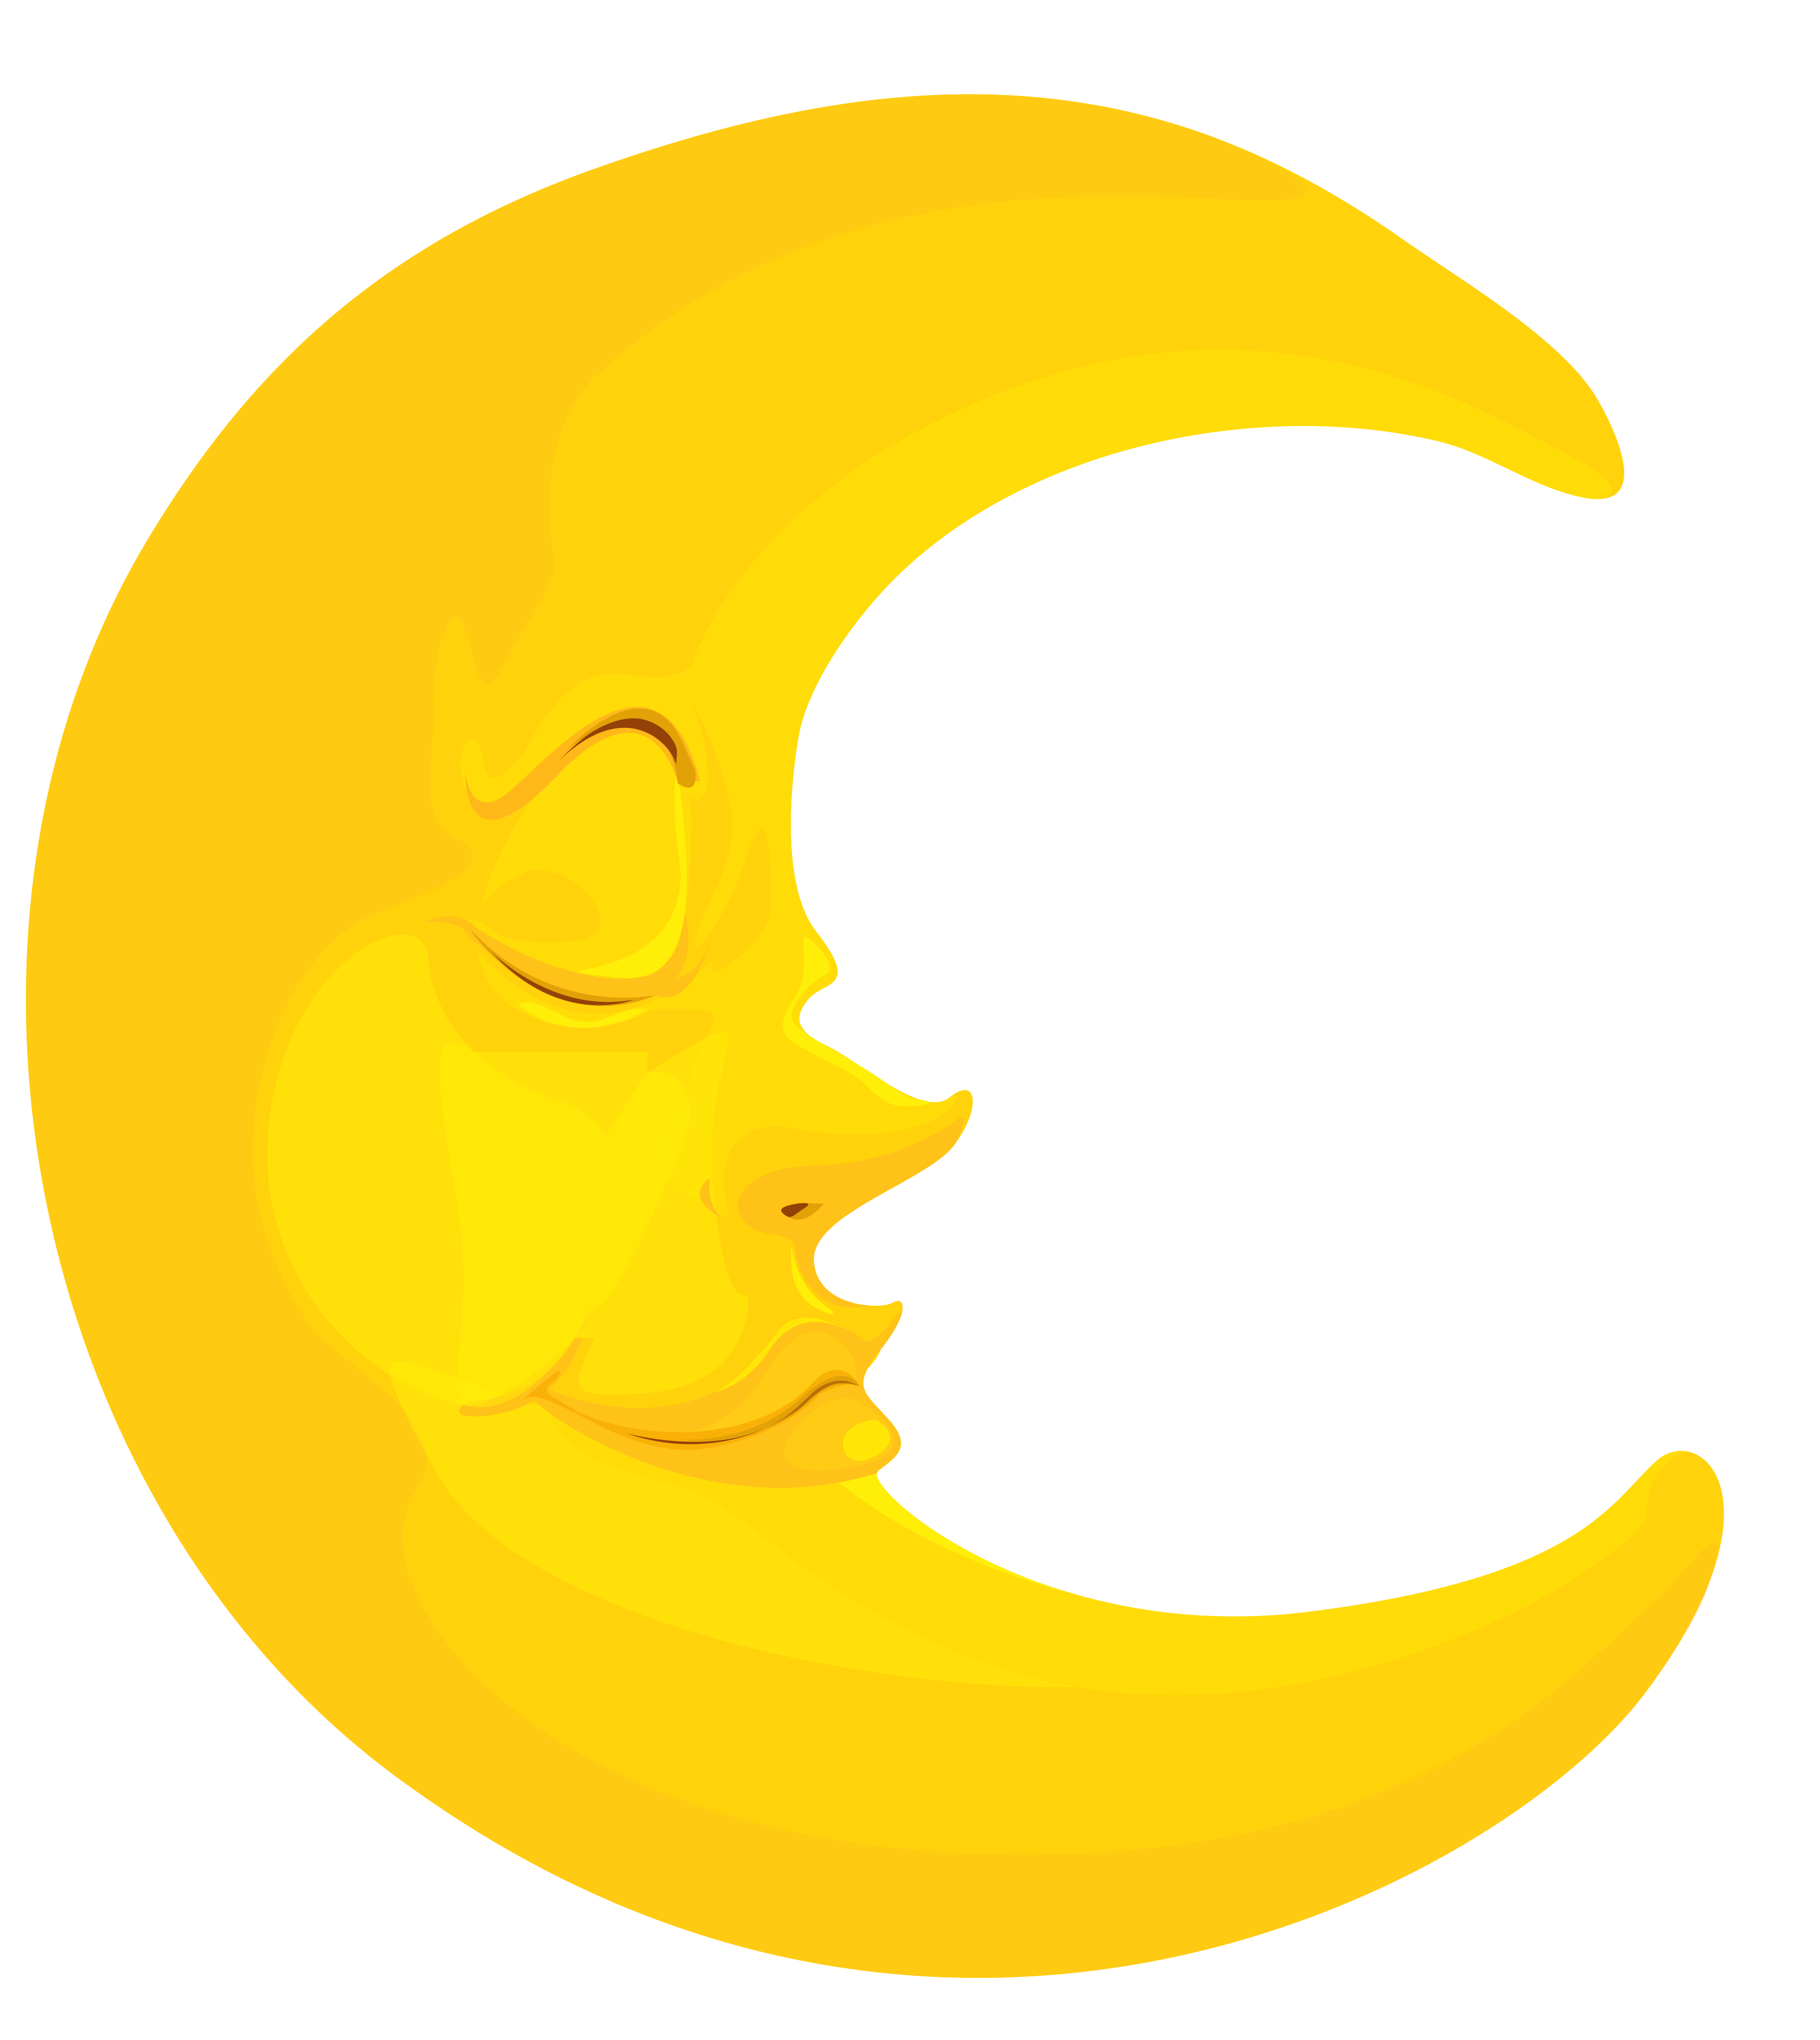 Moon Clipart U0026middot; Moon Clipart-moon clipart u0026middot; moon clipart-19